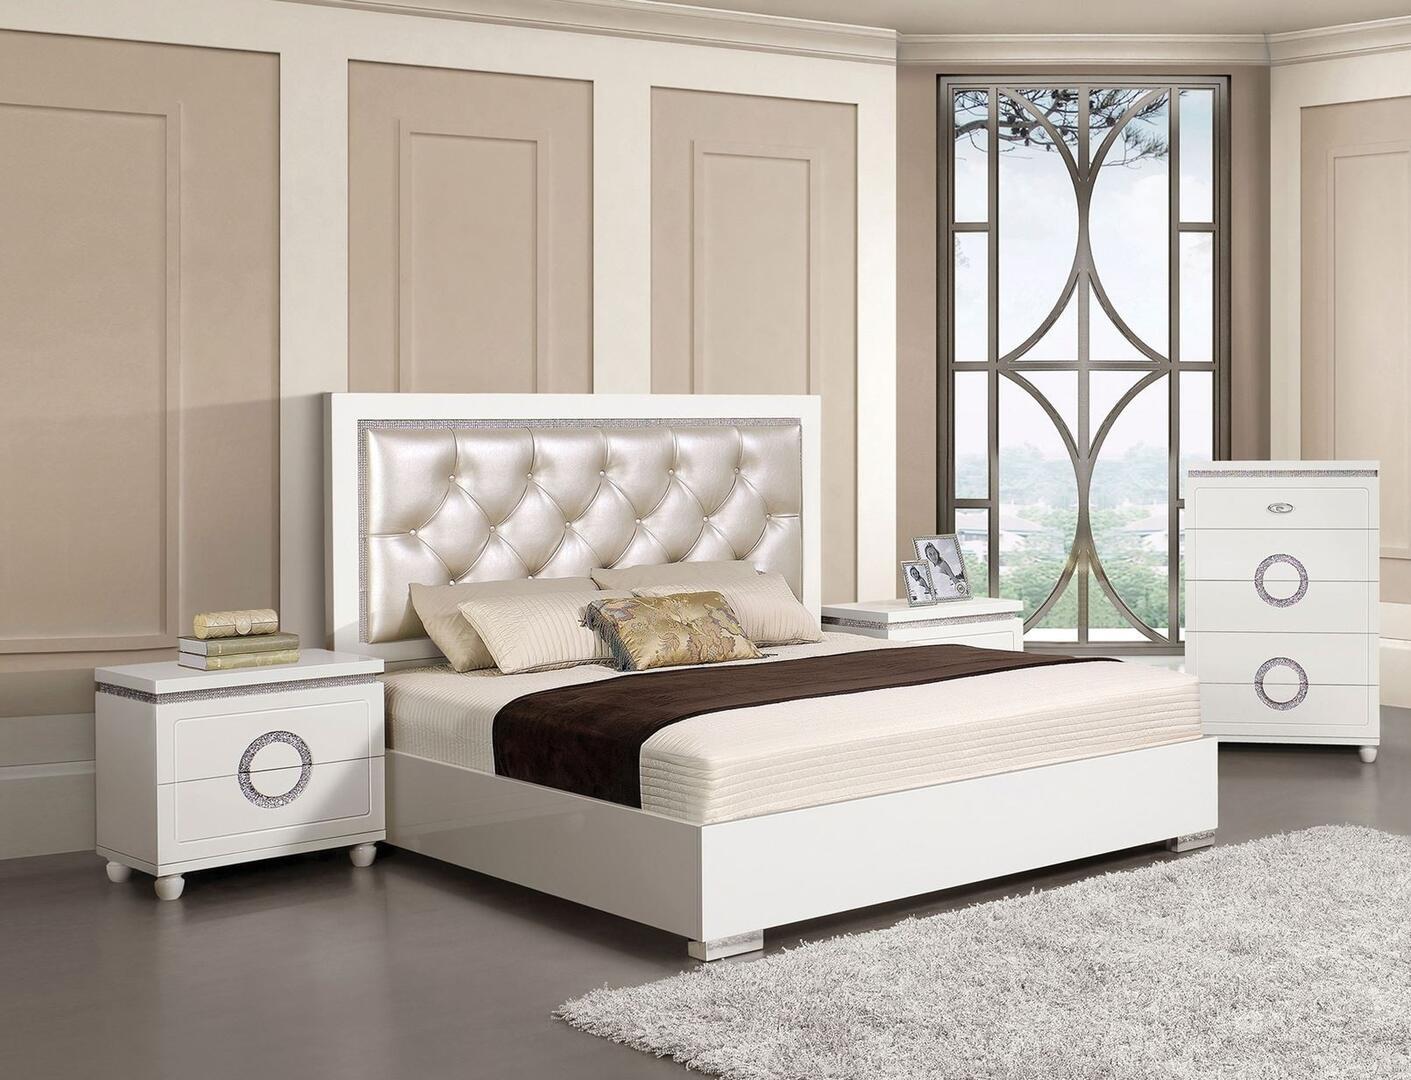 Admirable Acme Furniture Vivaldi 4 Piece Queen Size Bedroom Set Download Free Architecture Designs Pendunizatbritishbridgeorg